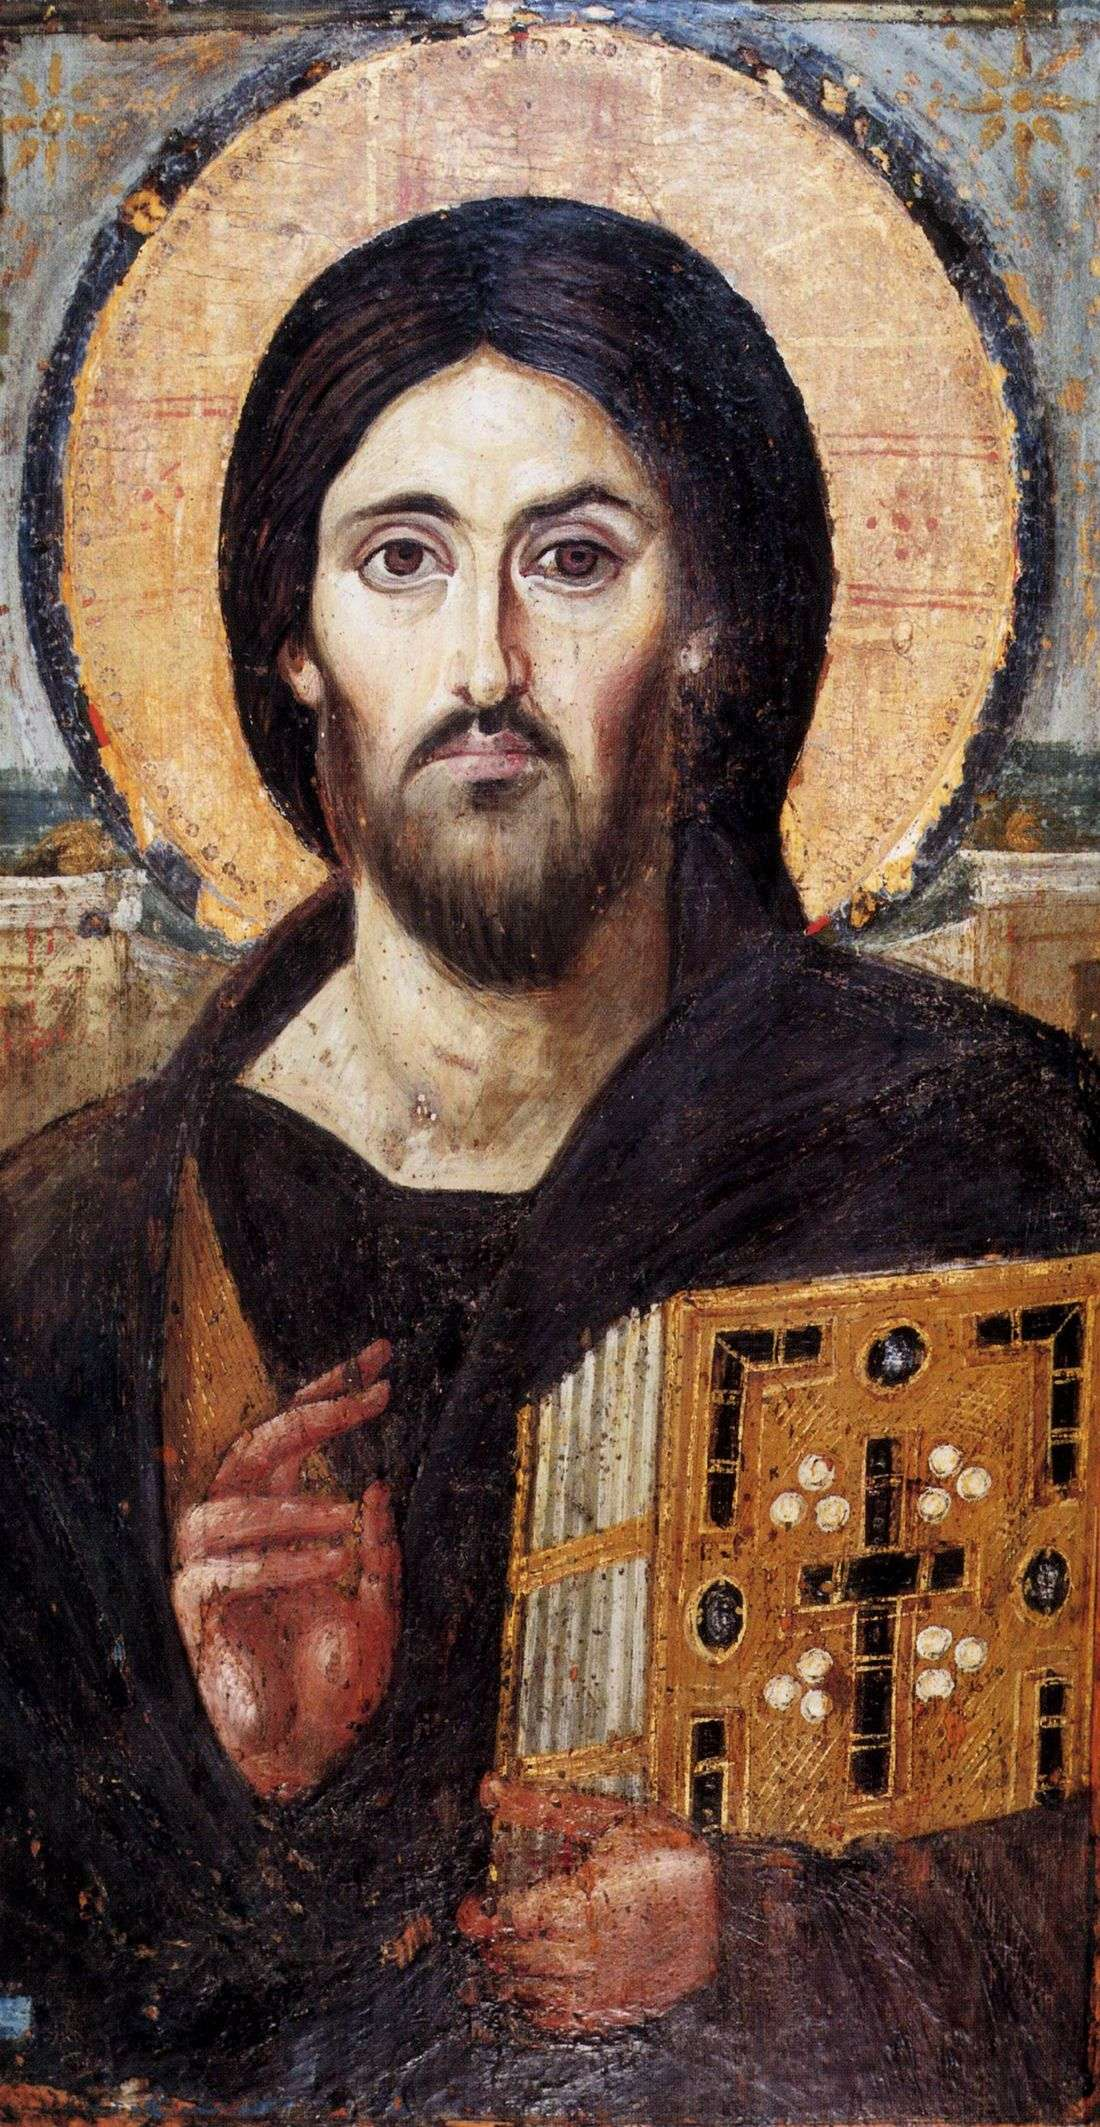 Jesus Christ In Gnosticism Gnosticism Explained